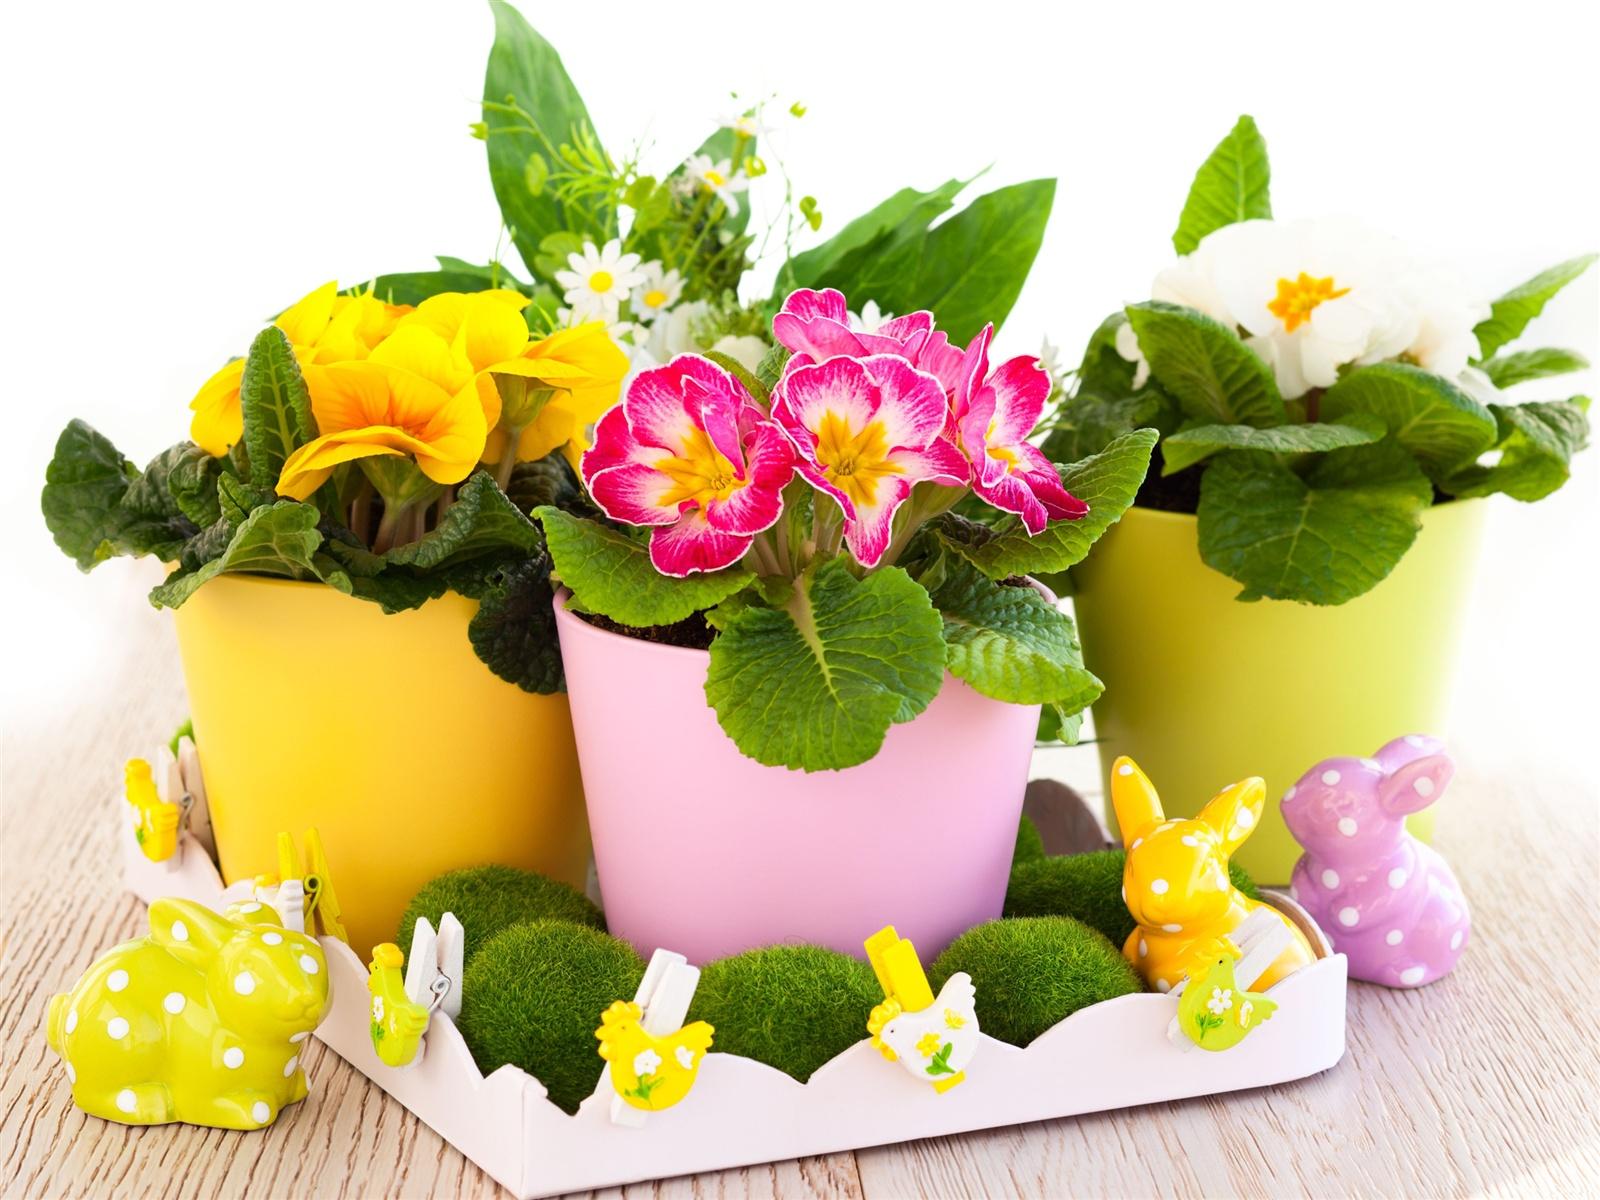 Easter flowers primrose wallpaper 1600x1200 resolution - Ostern wallpaper ...